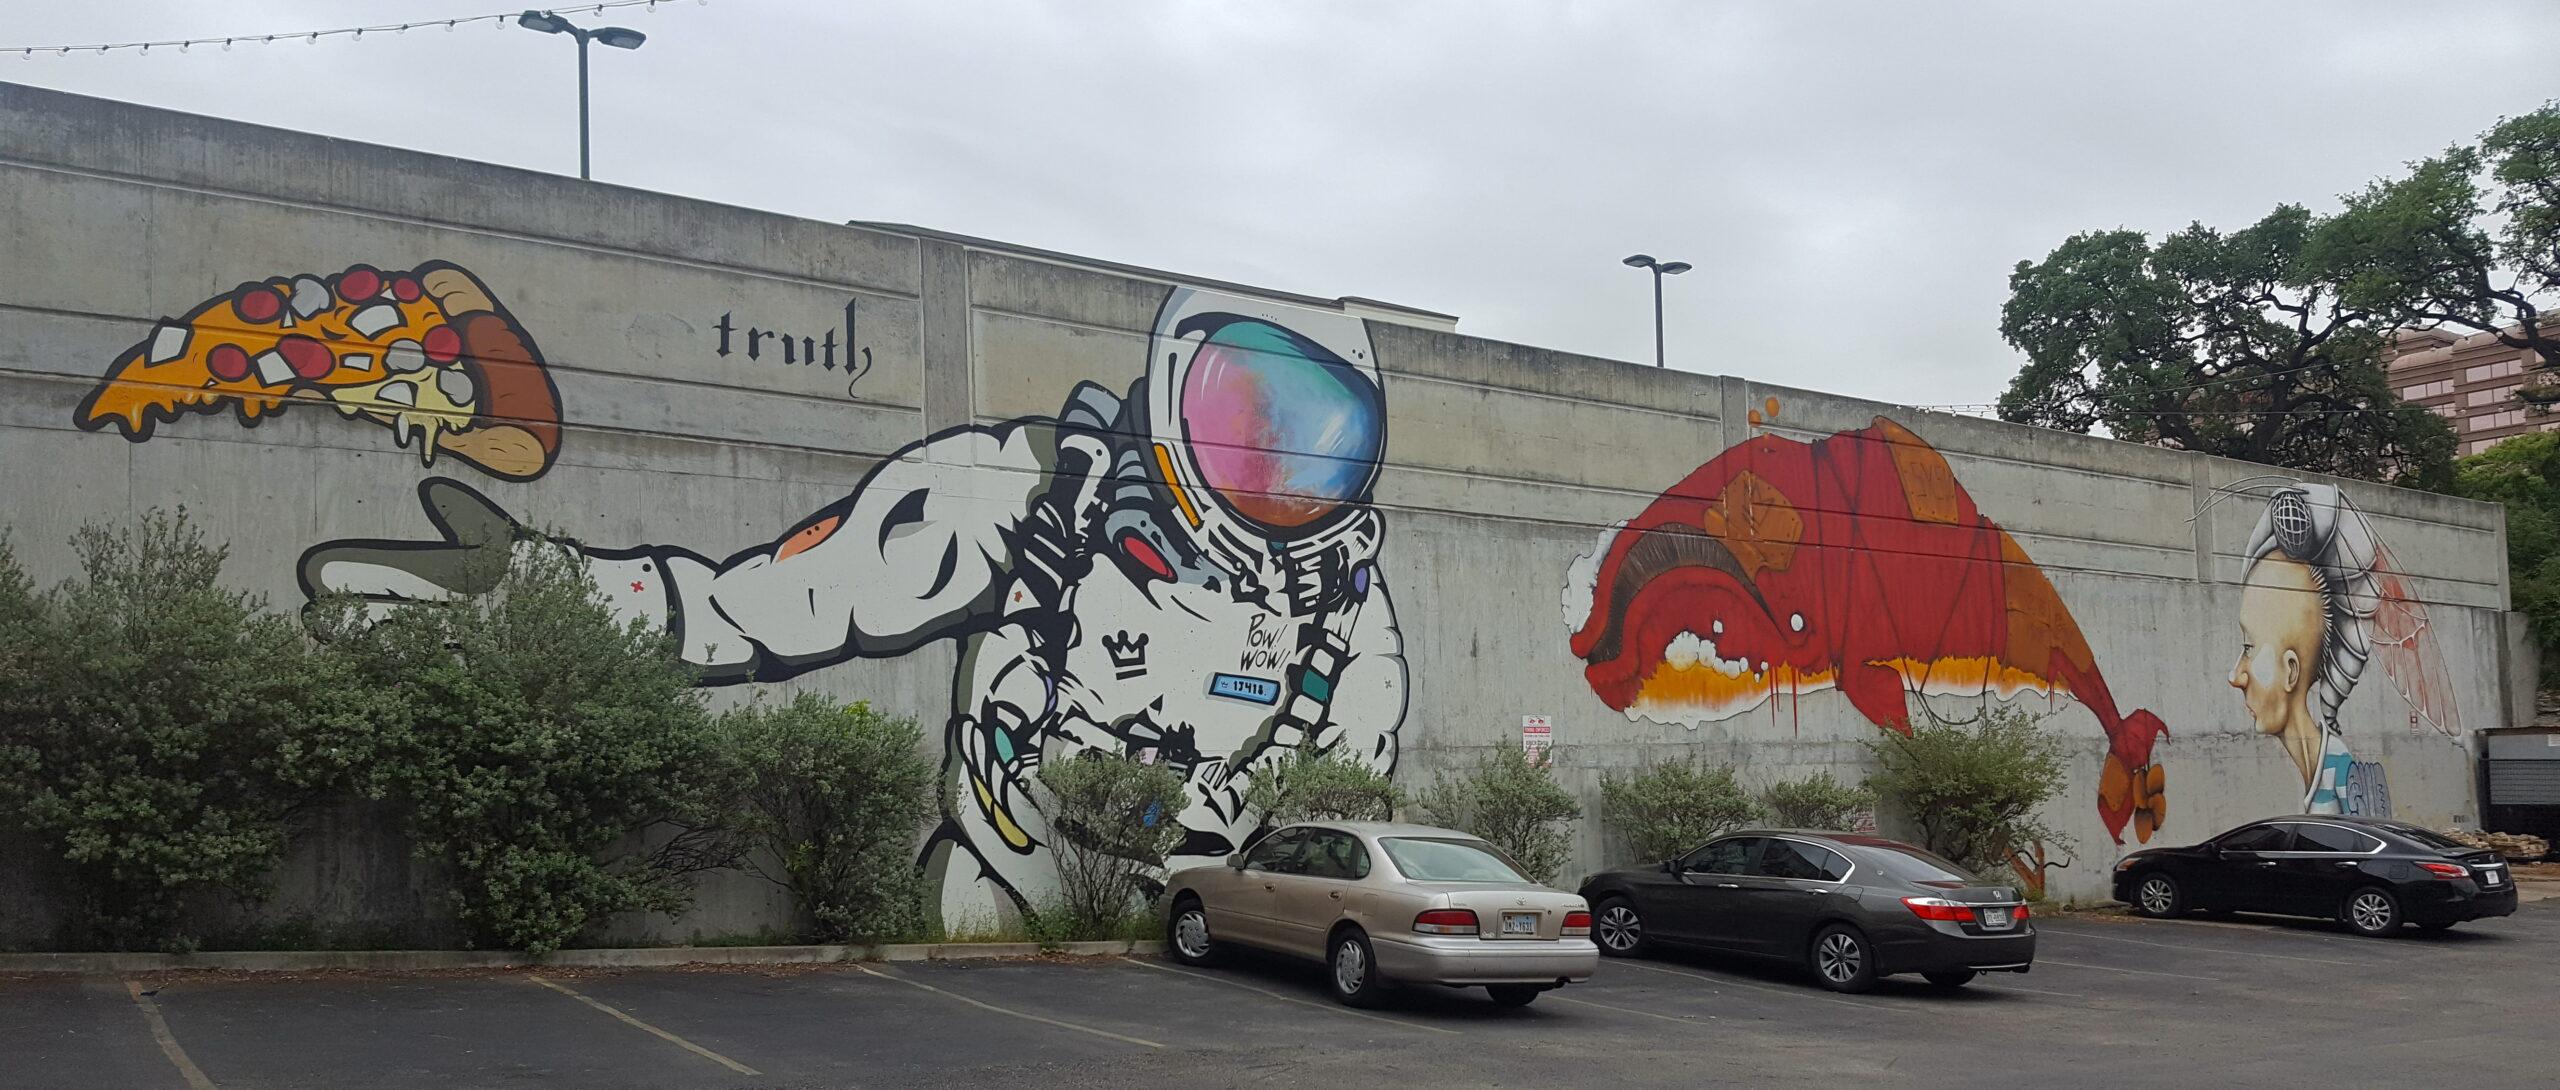 Astronaut Pizza Mural